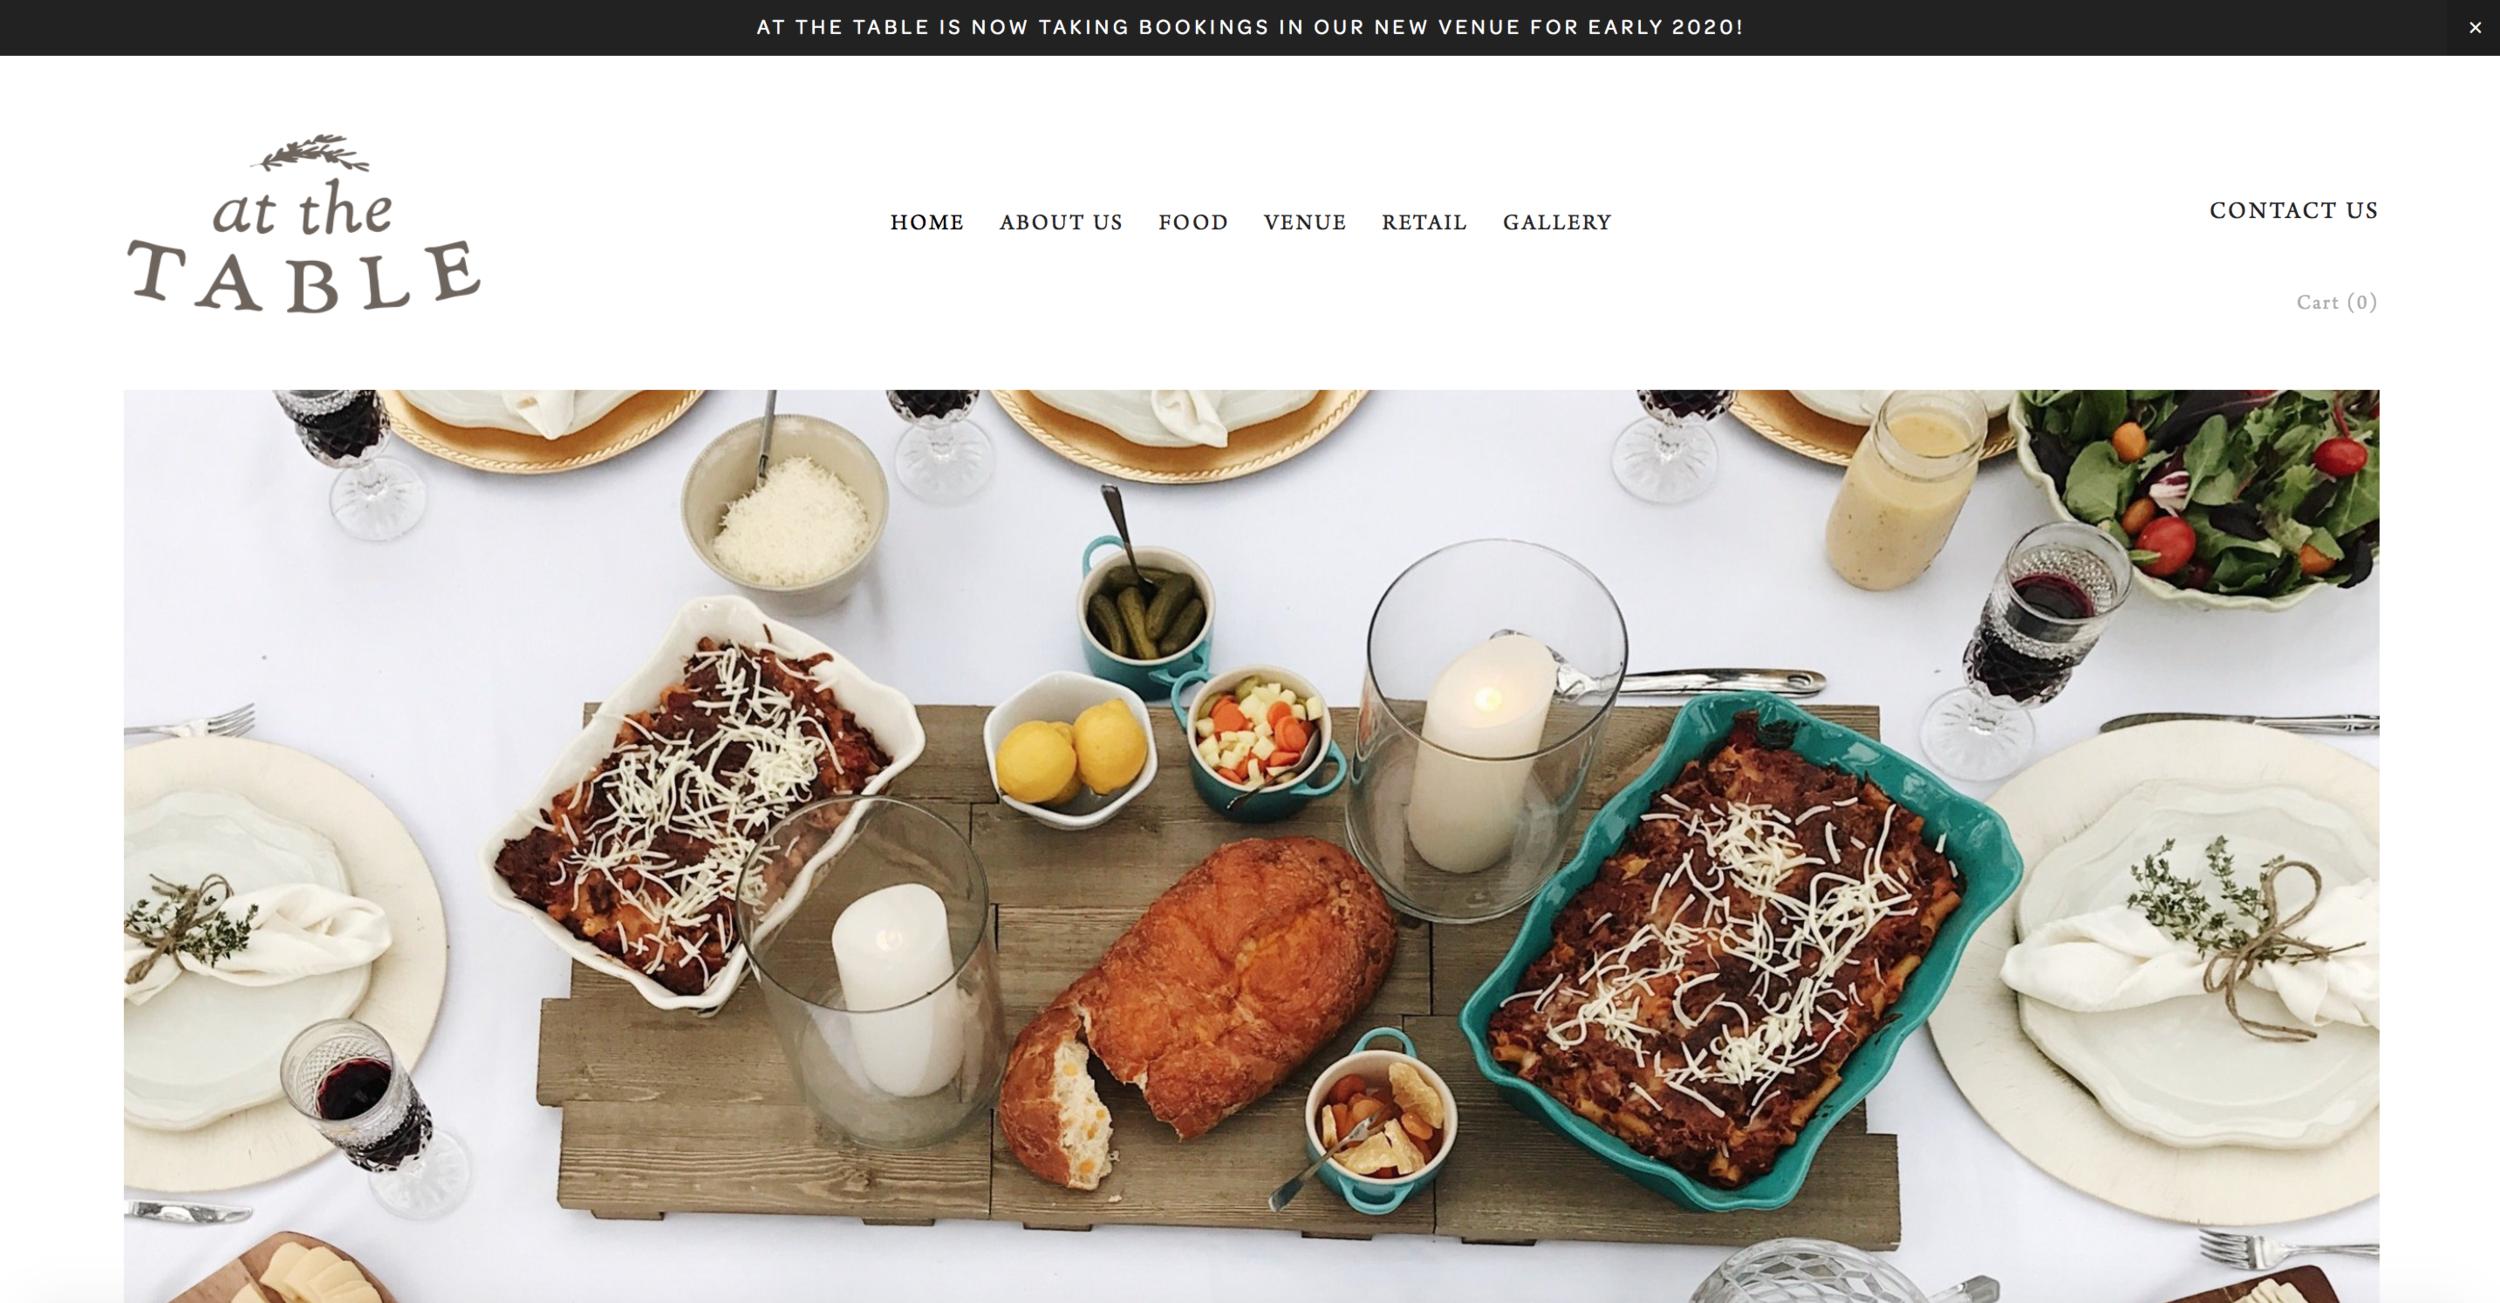 atthetable-website.jpg